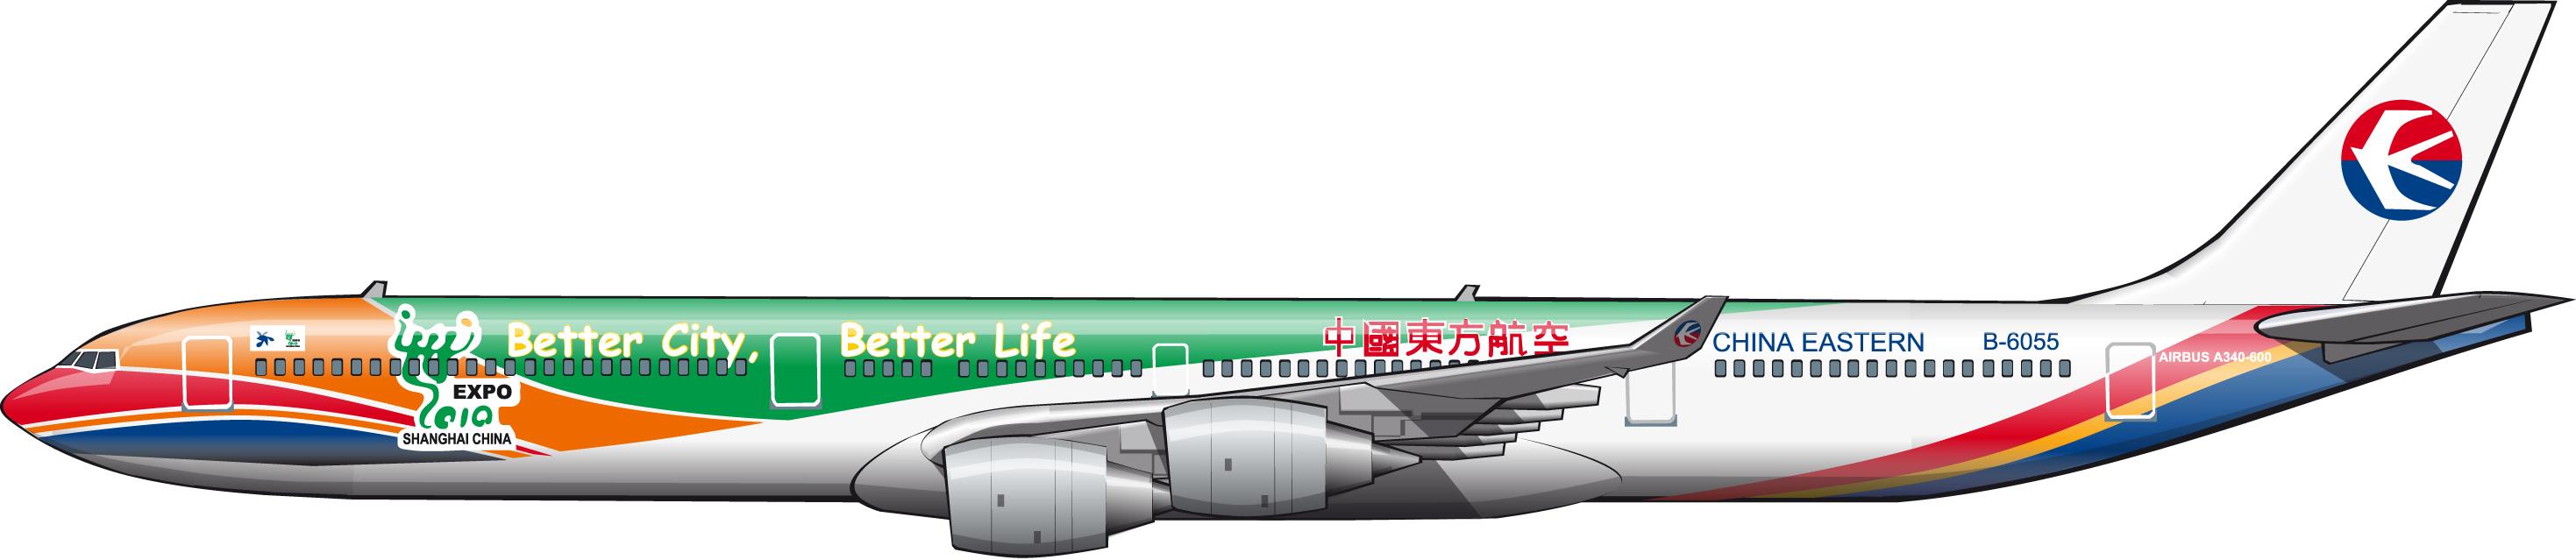 a-340-600chinaeasternshangaiexpo